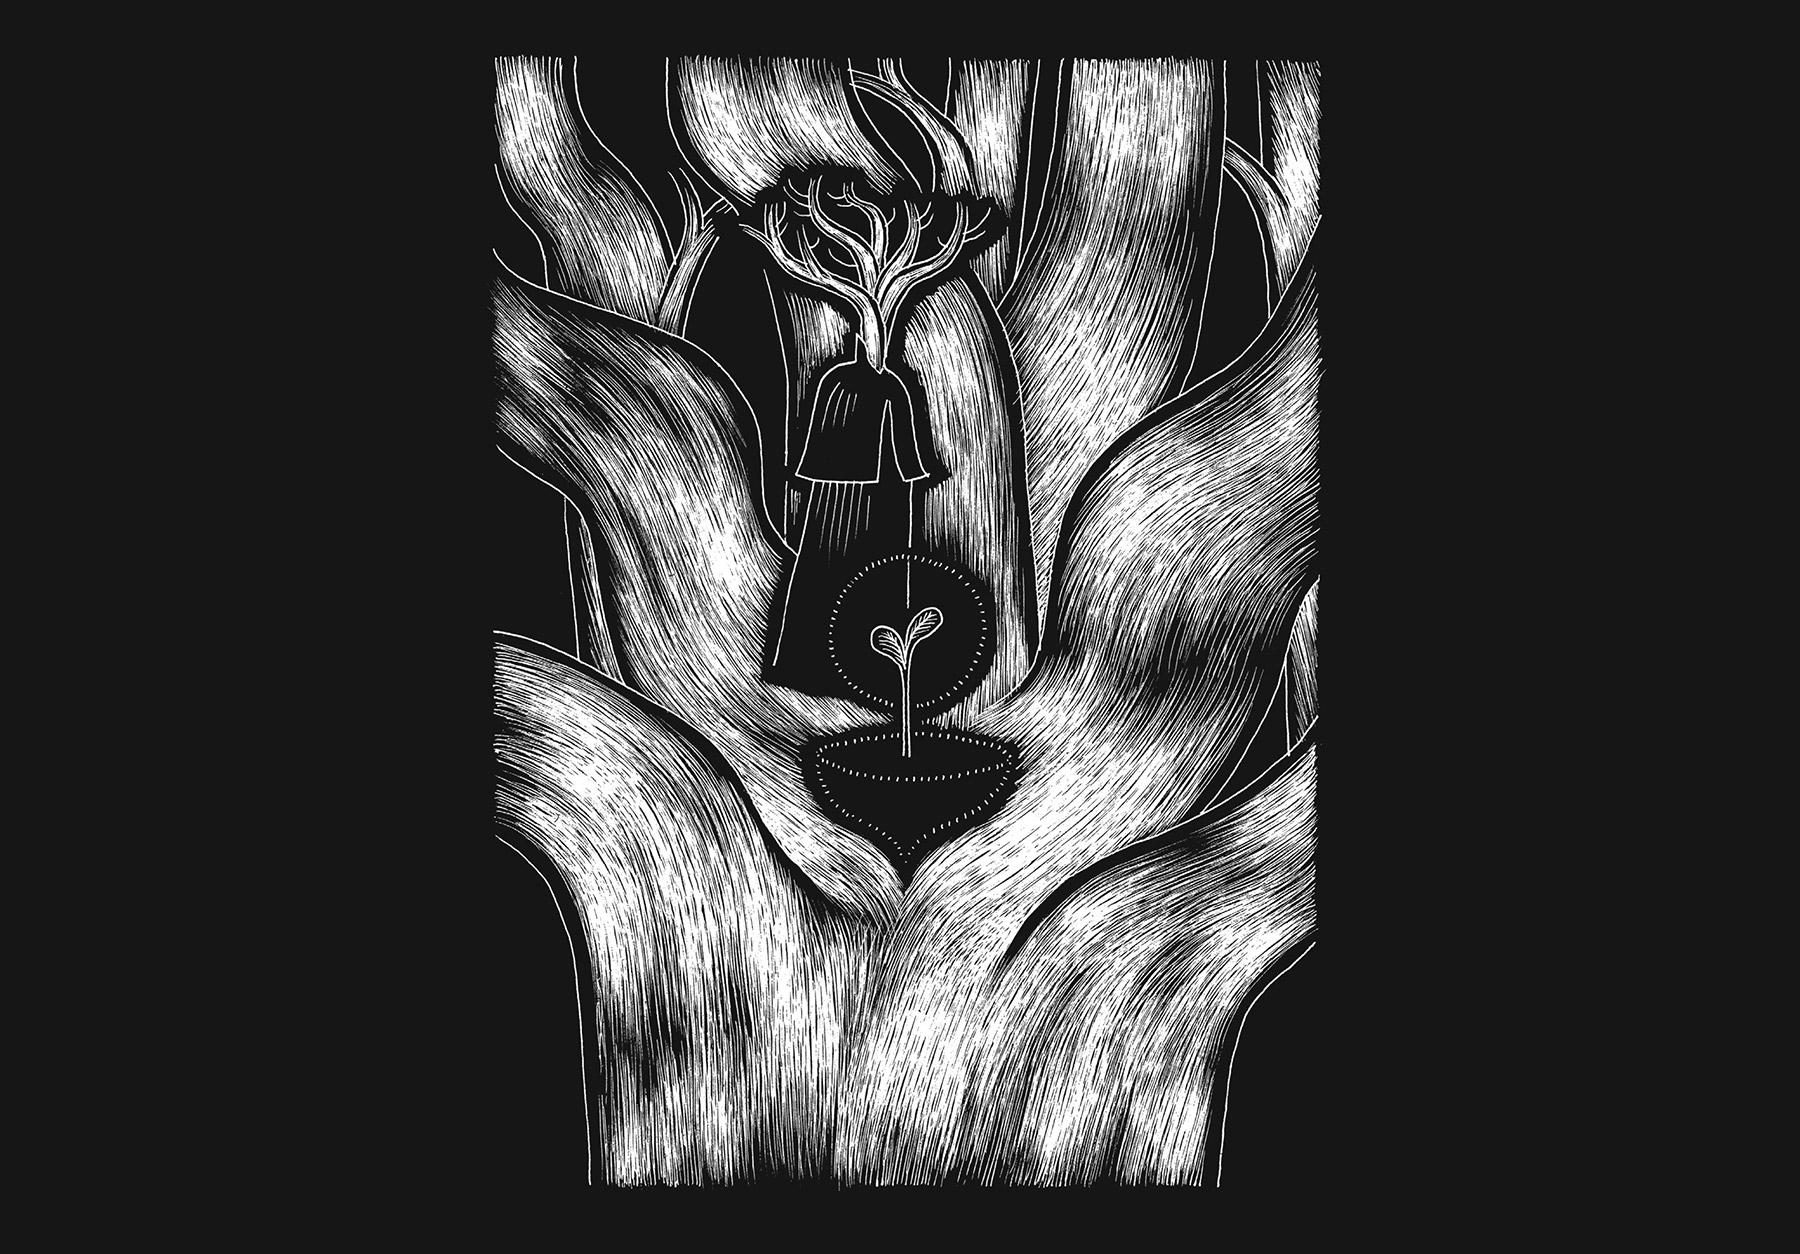 davidm-arboreal-web_expanded-9.jpg